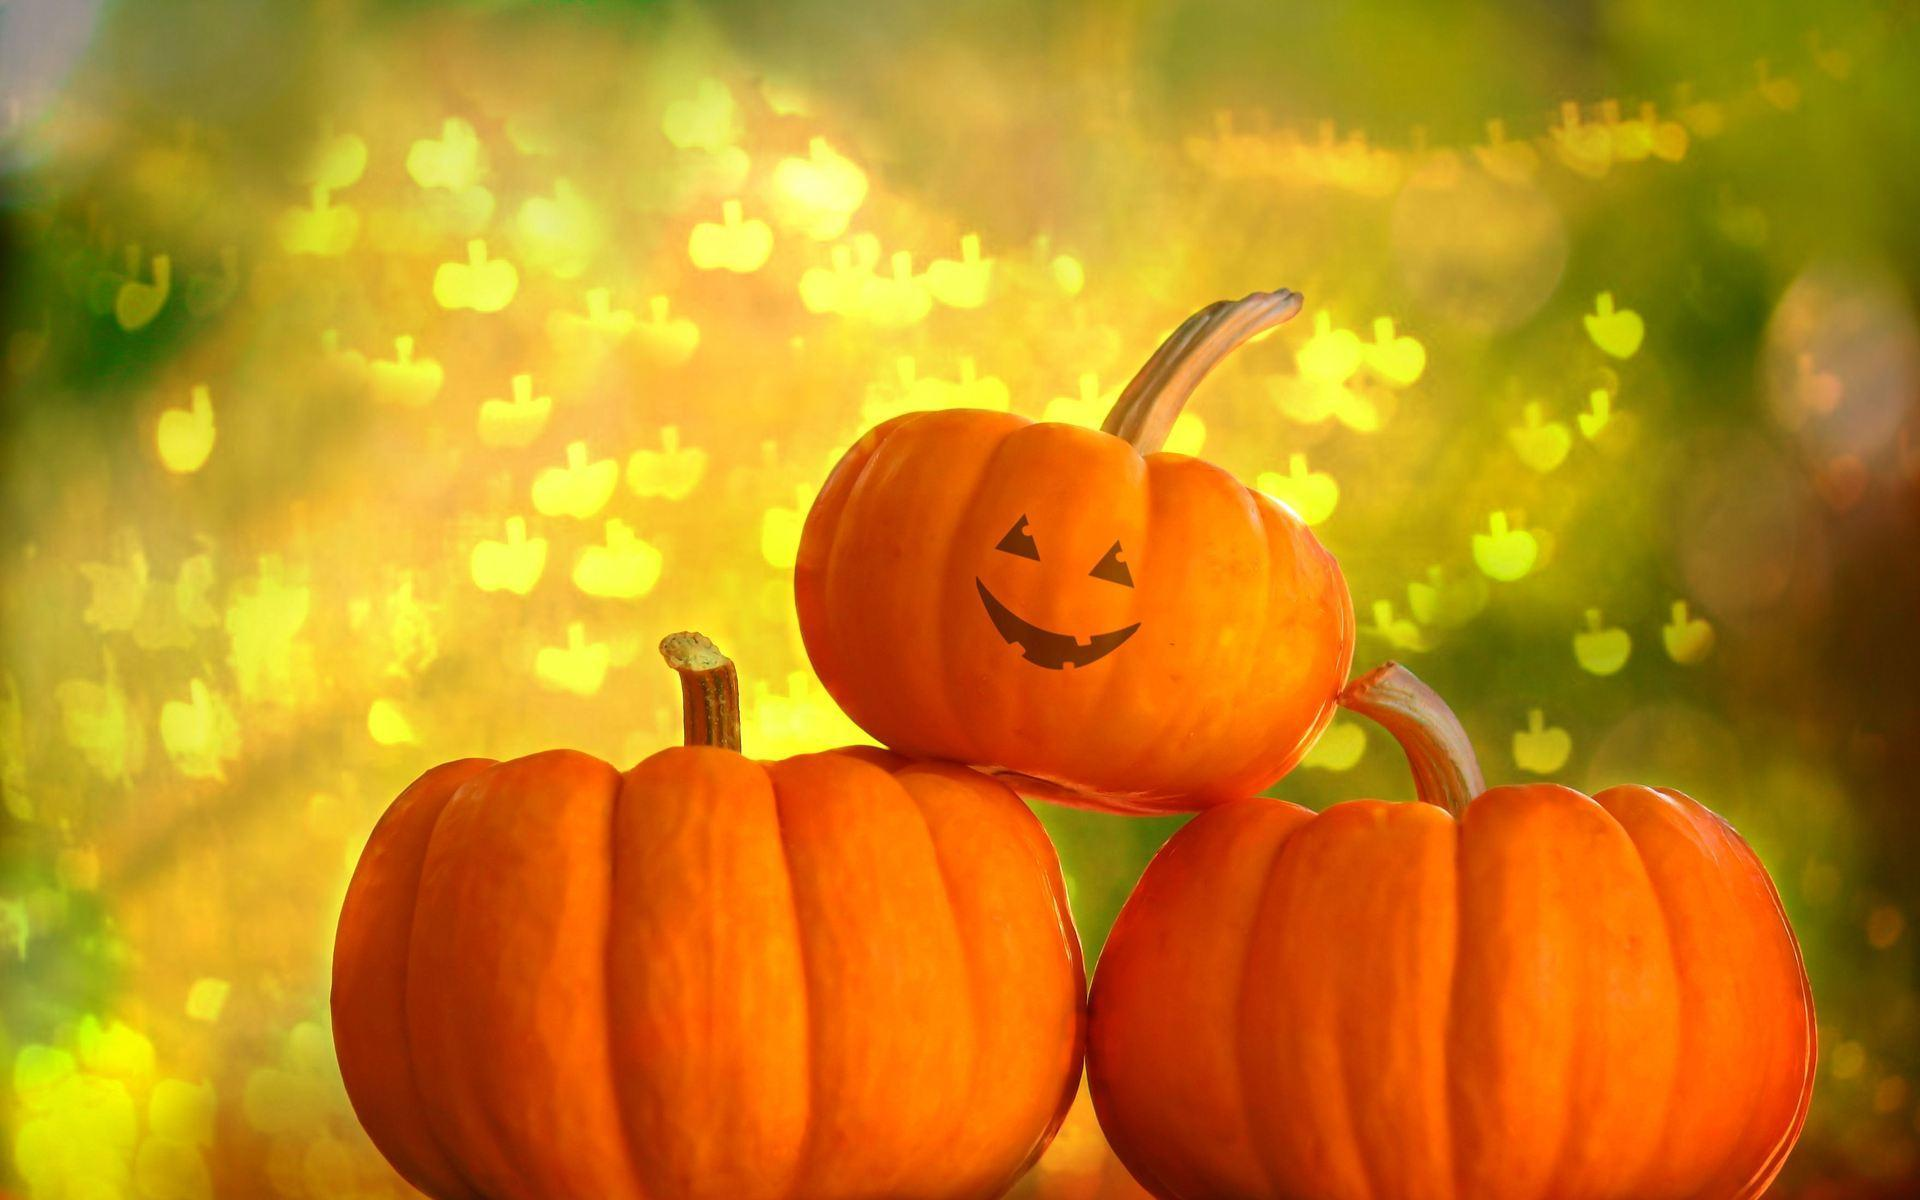 aesthetic pumpkin wallpaper